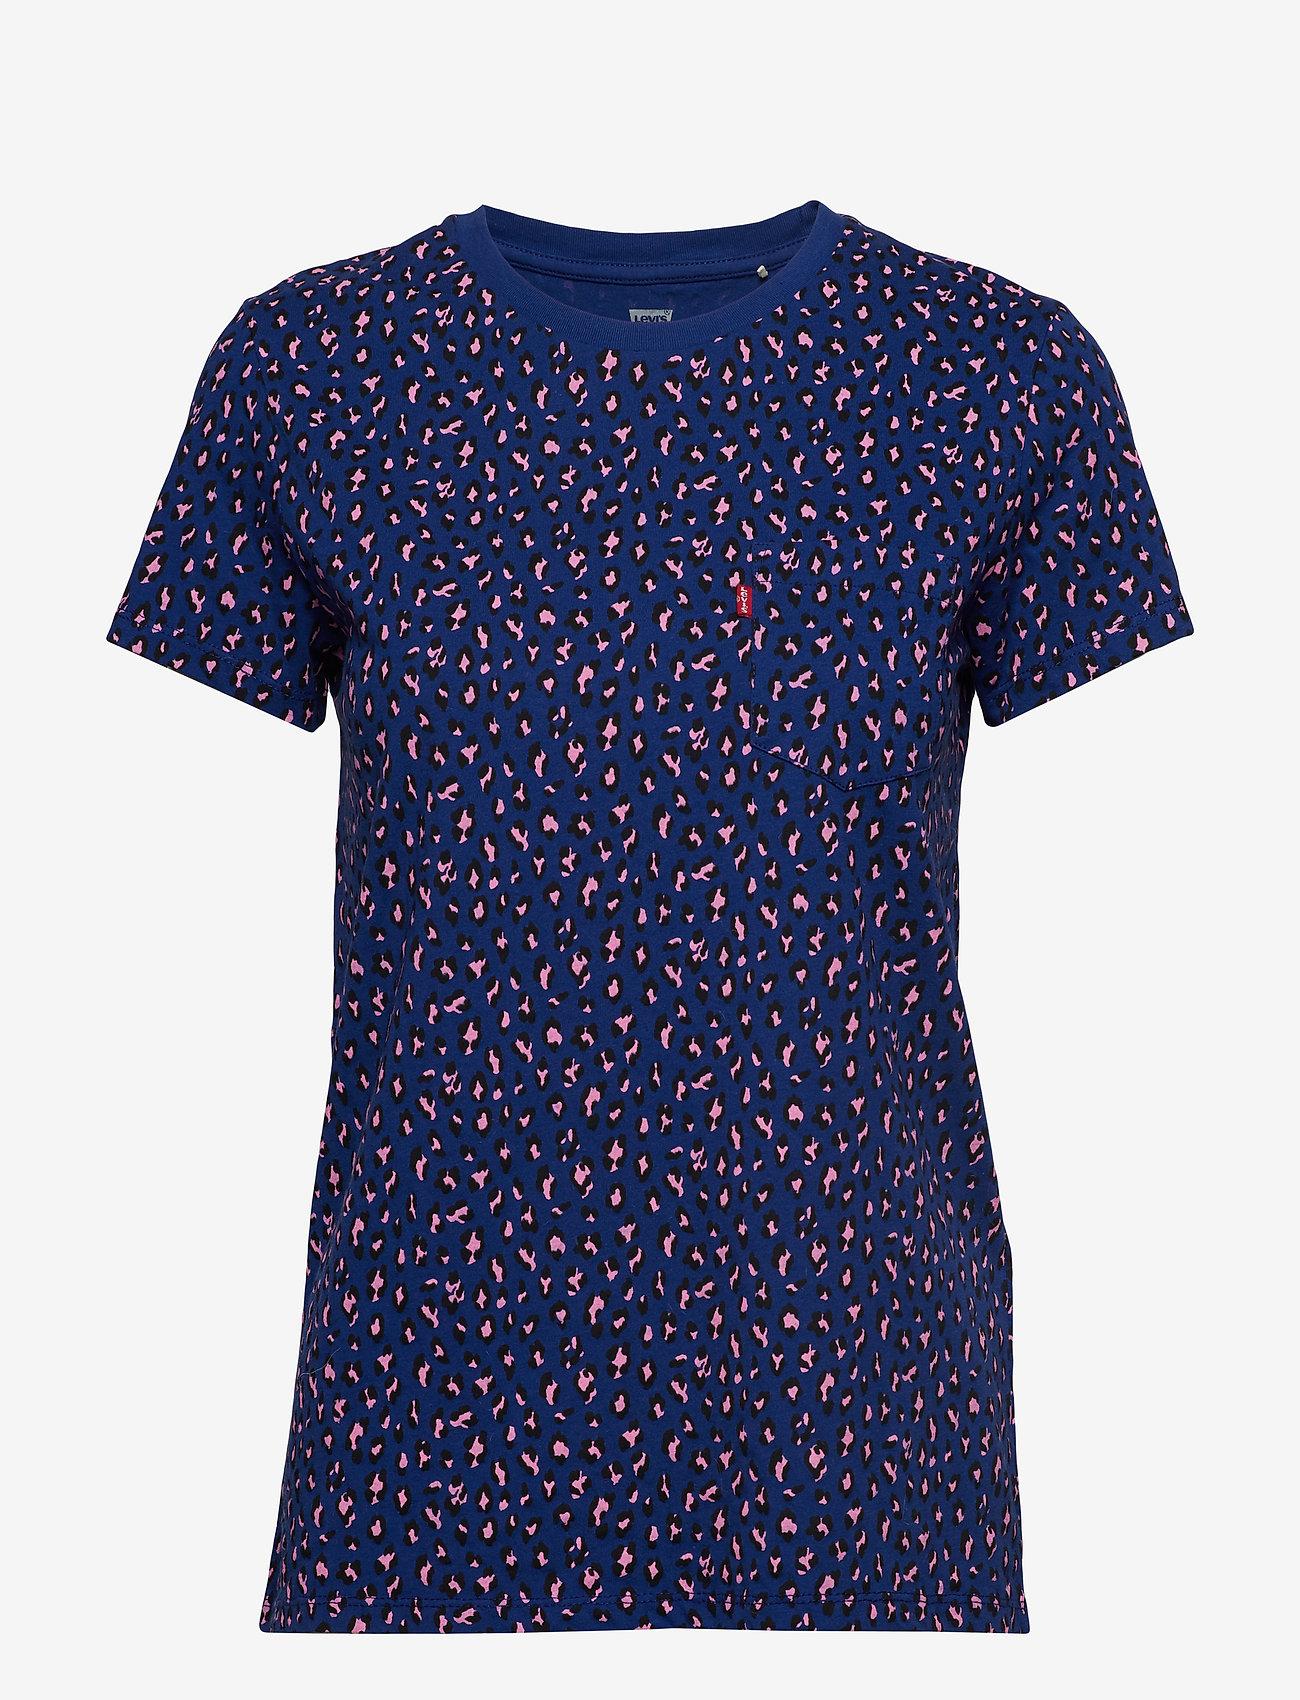 LEVI´S Women - THE PERFECT CREW FUN LEOPARD S - t-shirts - blues